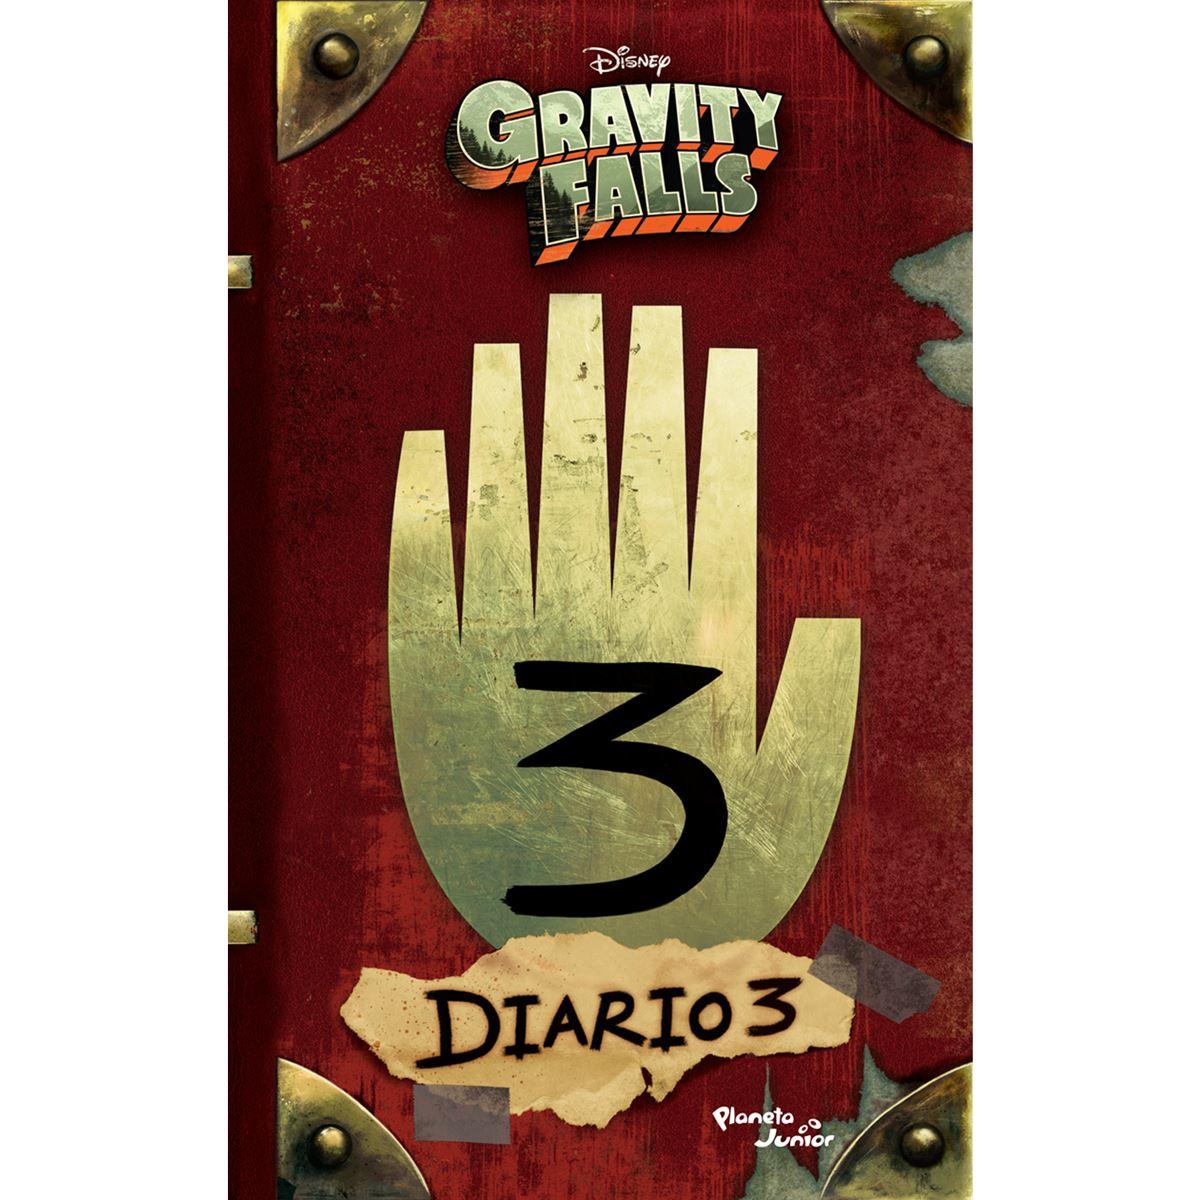 Gravity Falls Diario 3 Libro Sanborns